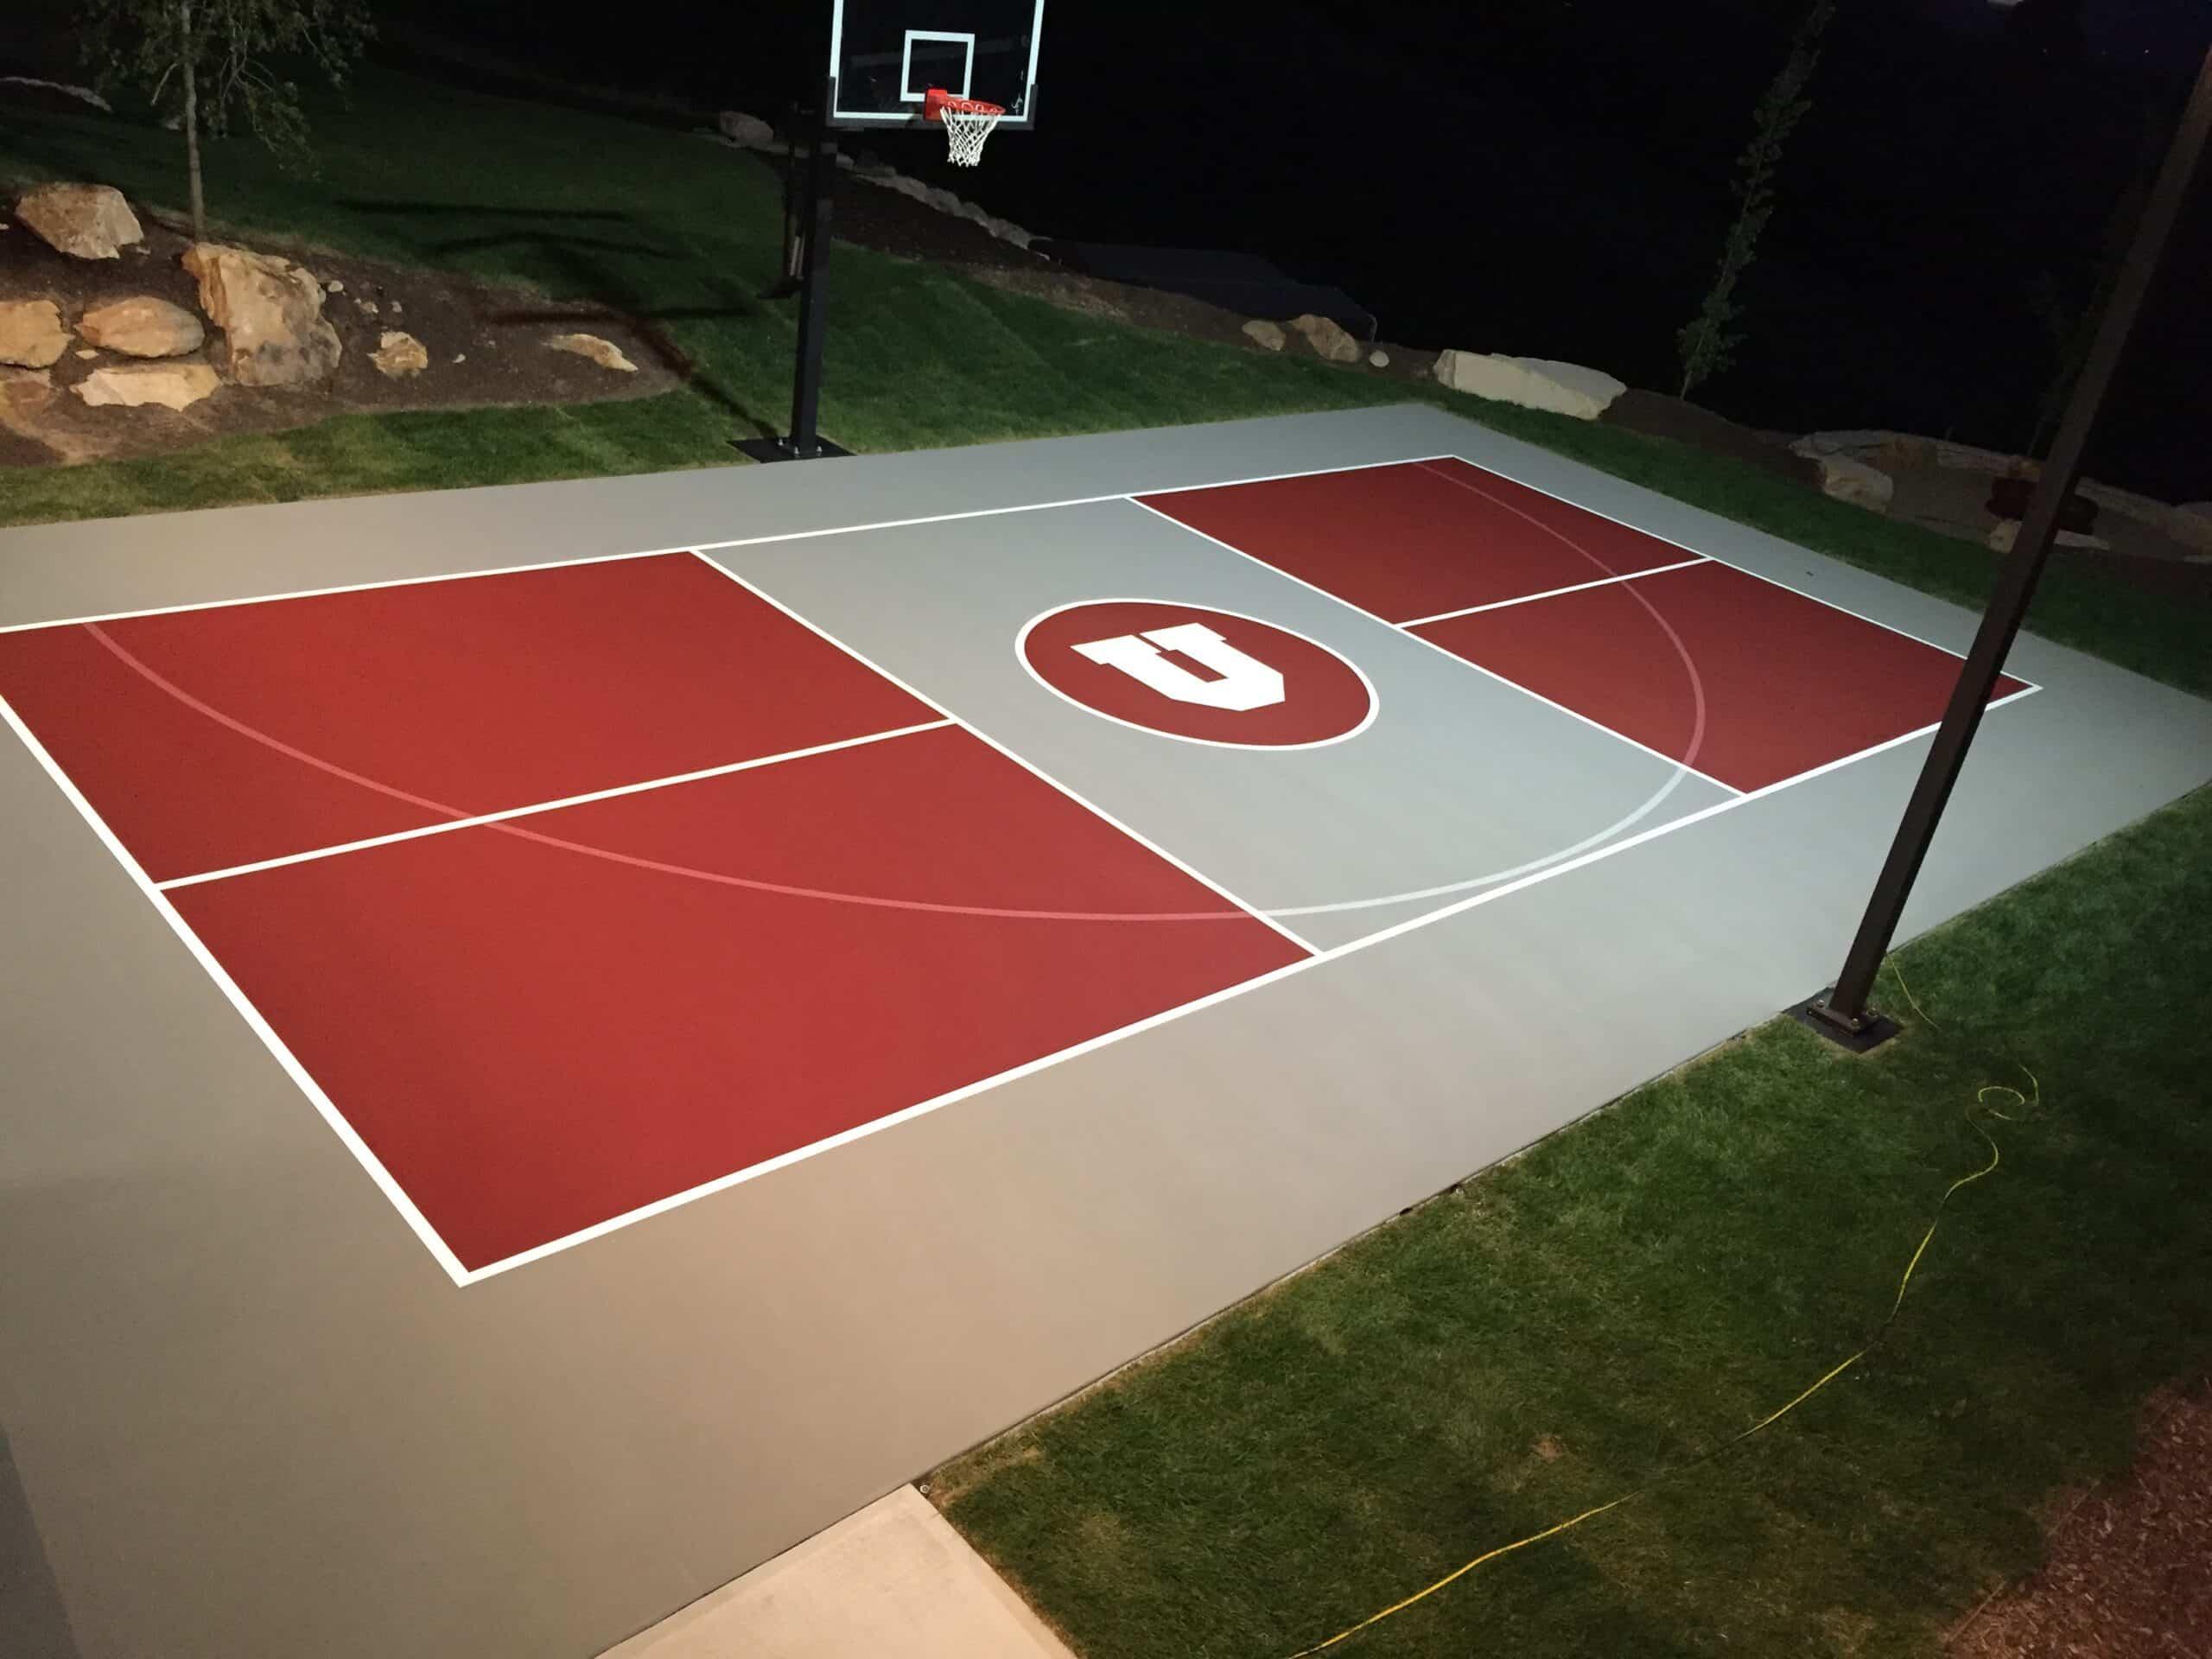 Utah Court Surfacing Outdoor Sports Court Pickleball Court